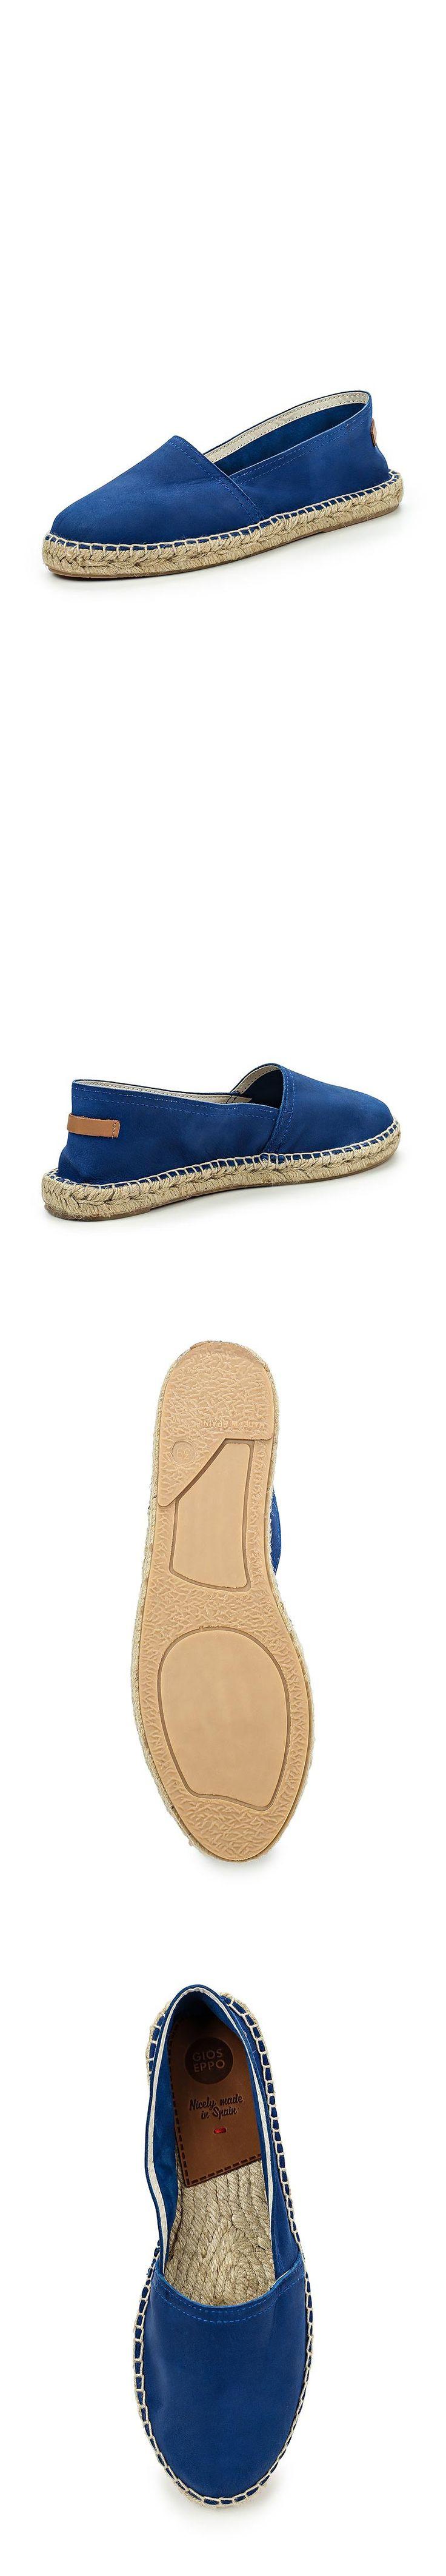 Женская обувь эспадрильи Gioseppo за 3990.00 руб.